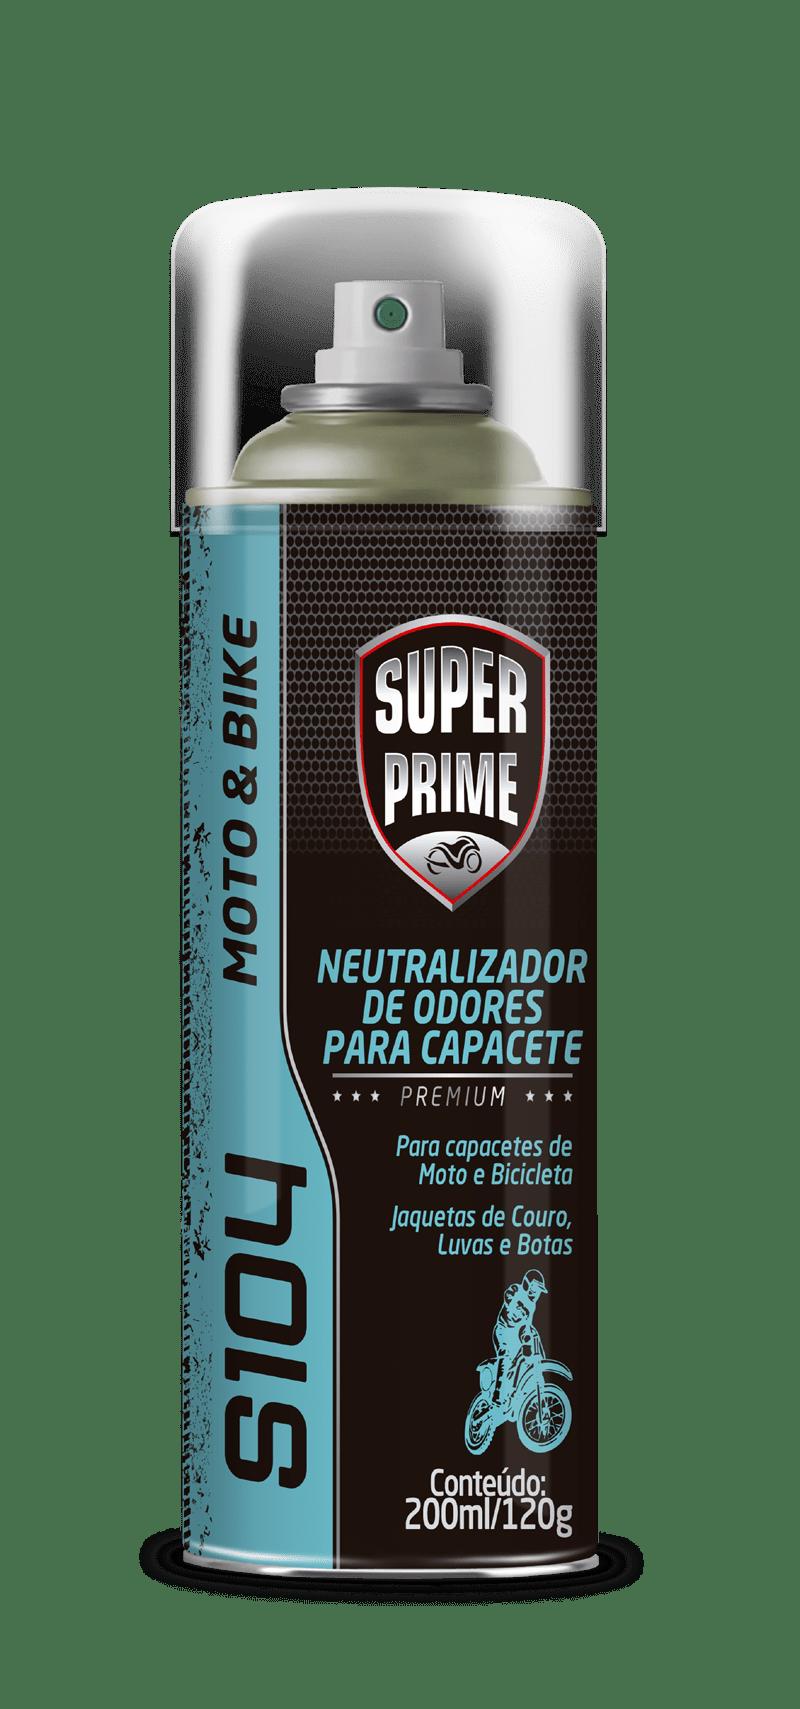 Neutralizador de odores para capacete Lavanda Spray 200ml Super Prime Aerosol